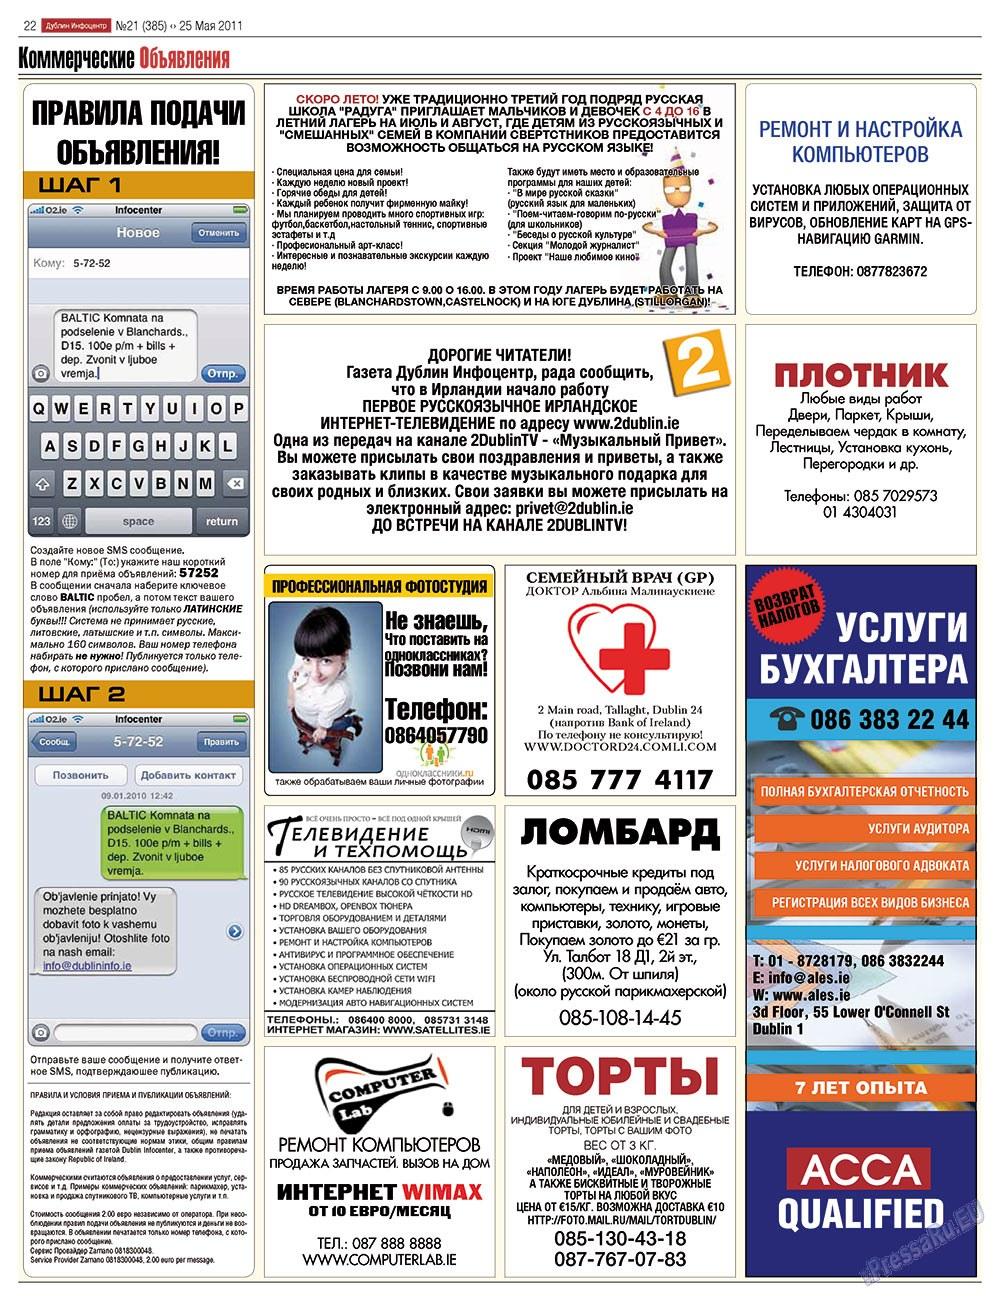 Дублин инфоцентр (газета). 2011 год, номер 21, стр. 22